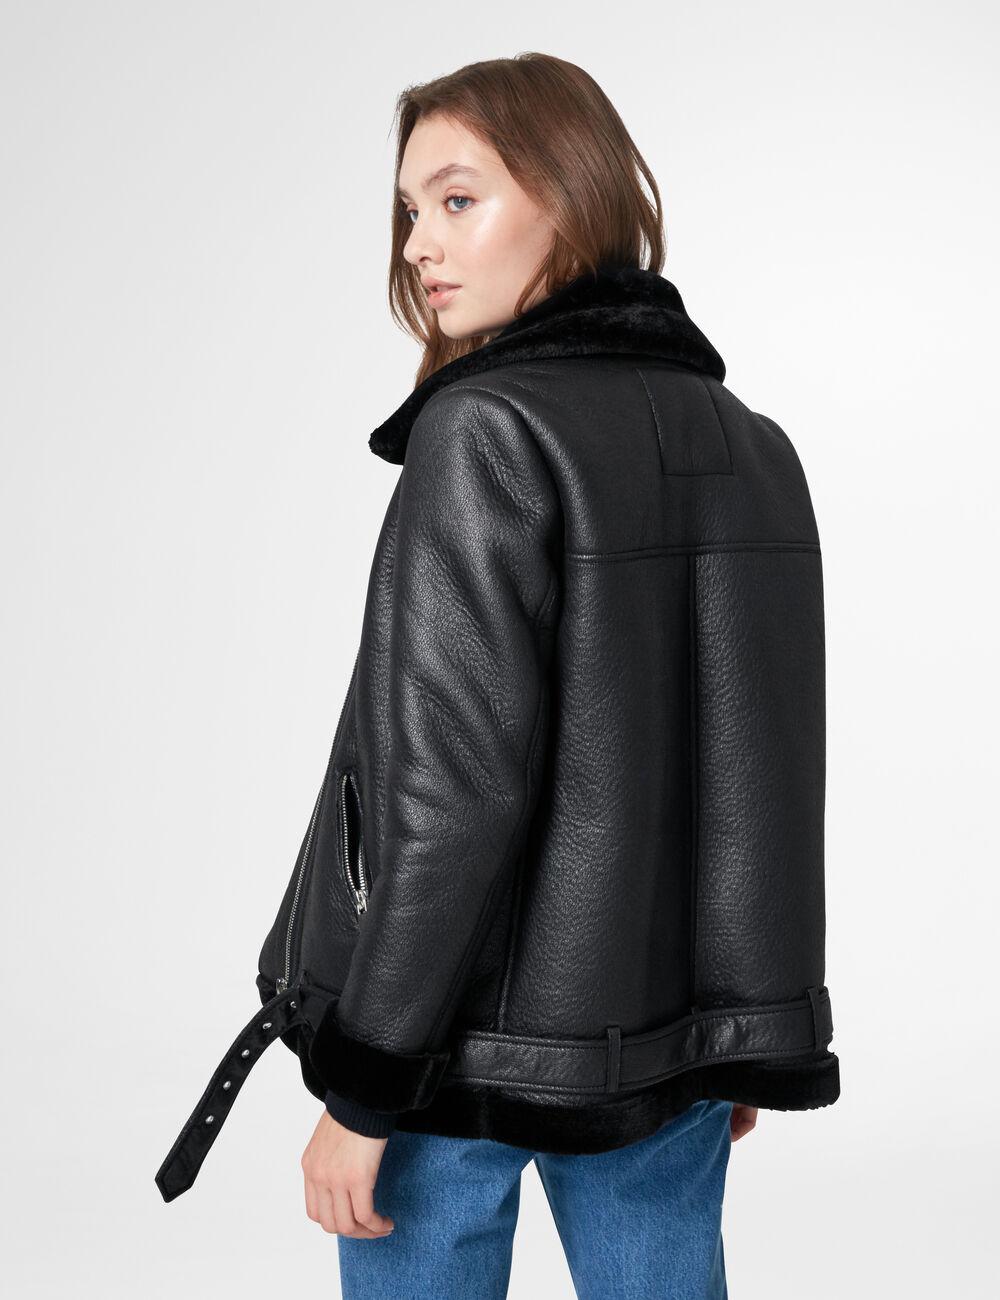 Jennyfer veste en cuir